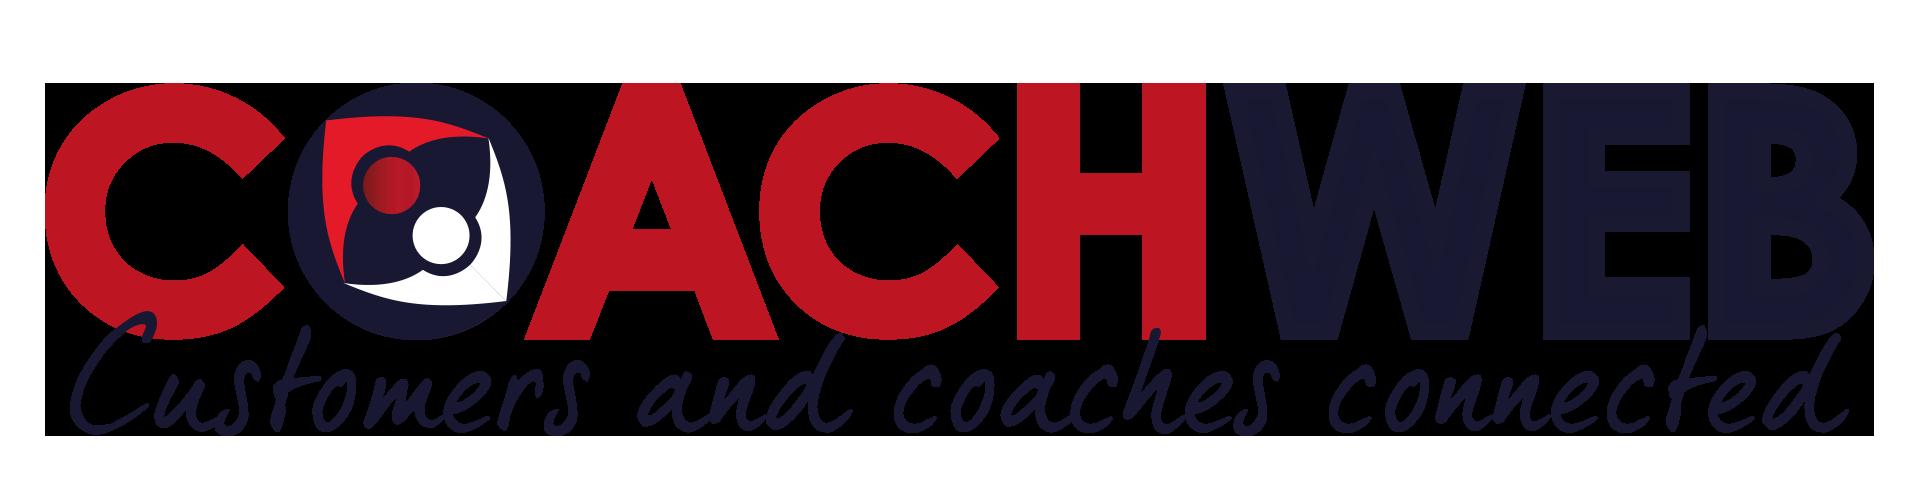 Coachweb